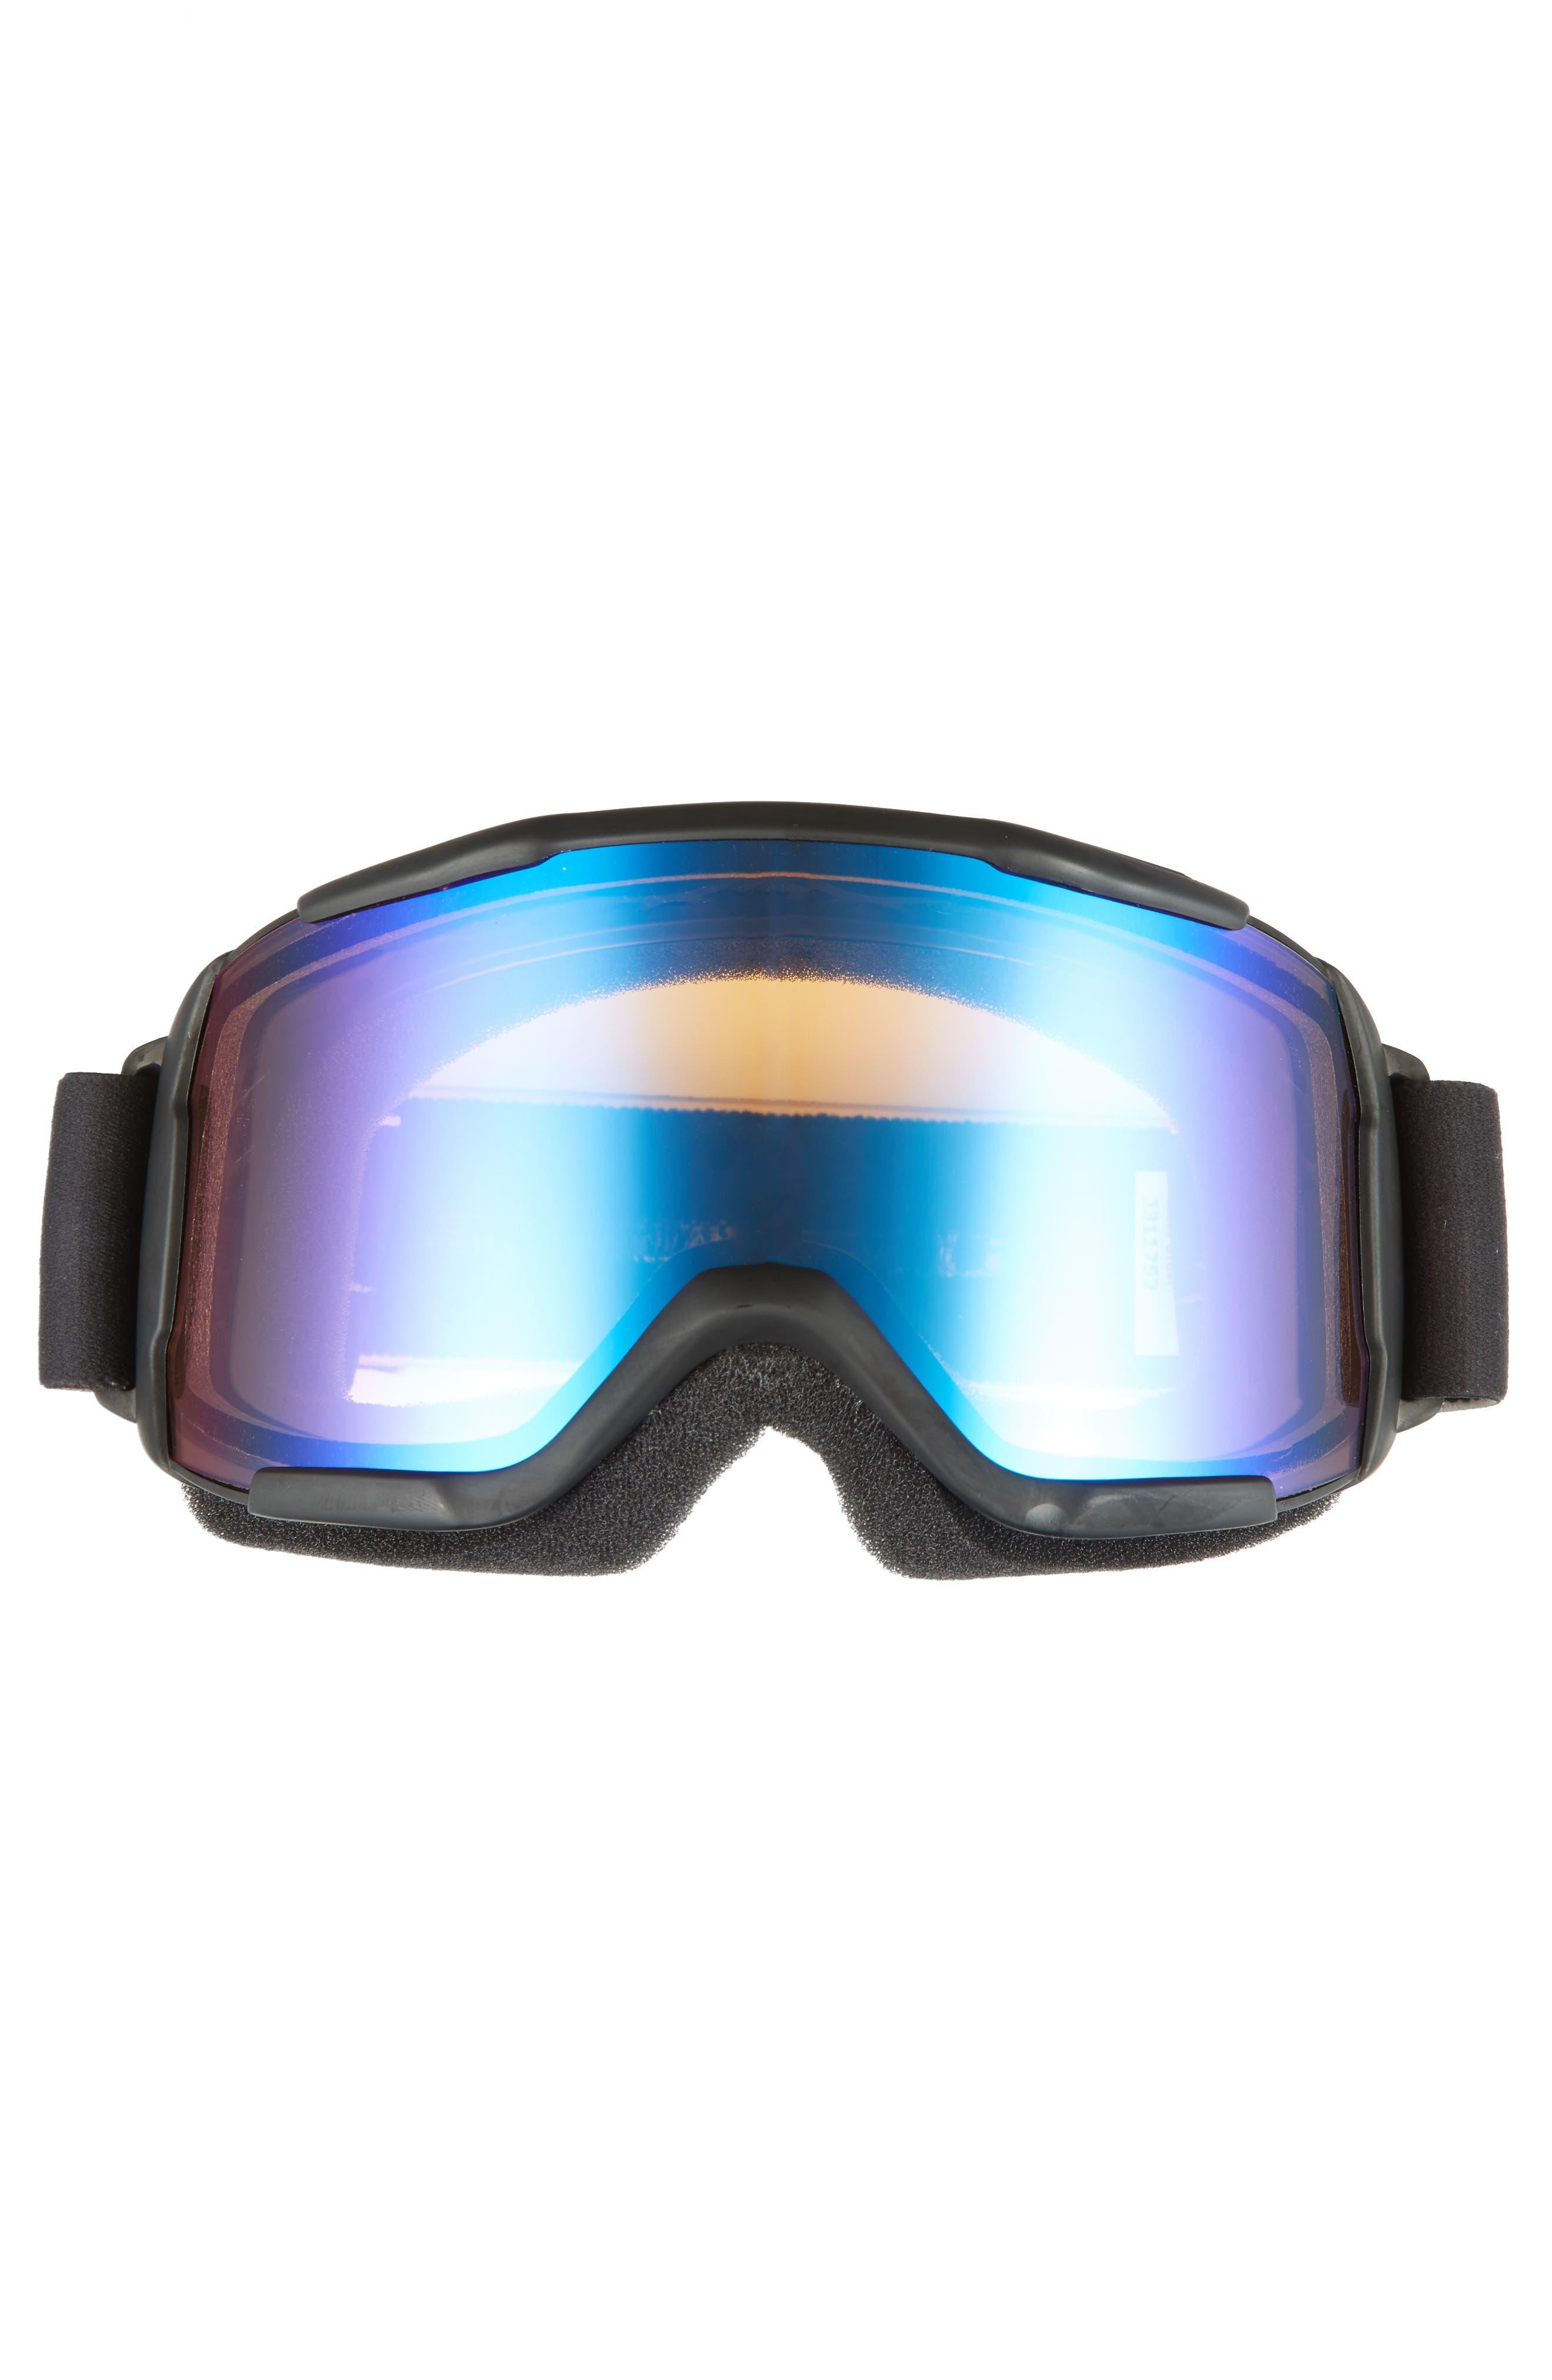 Daredevil 175mm Snow Goggles,                             Alternate thumbnail 3, color,                             BLACK/ MIRROR